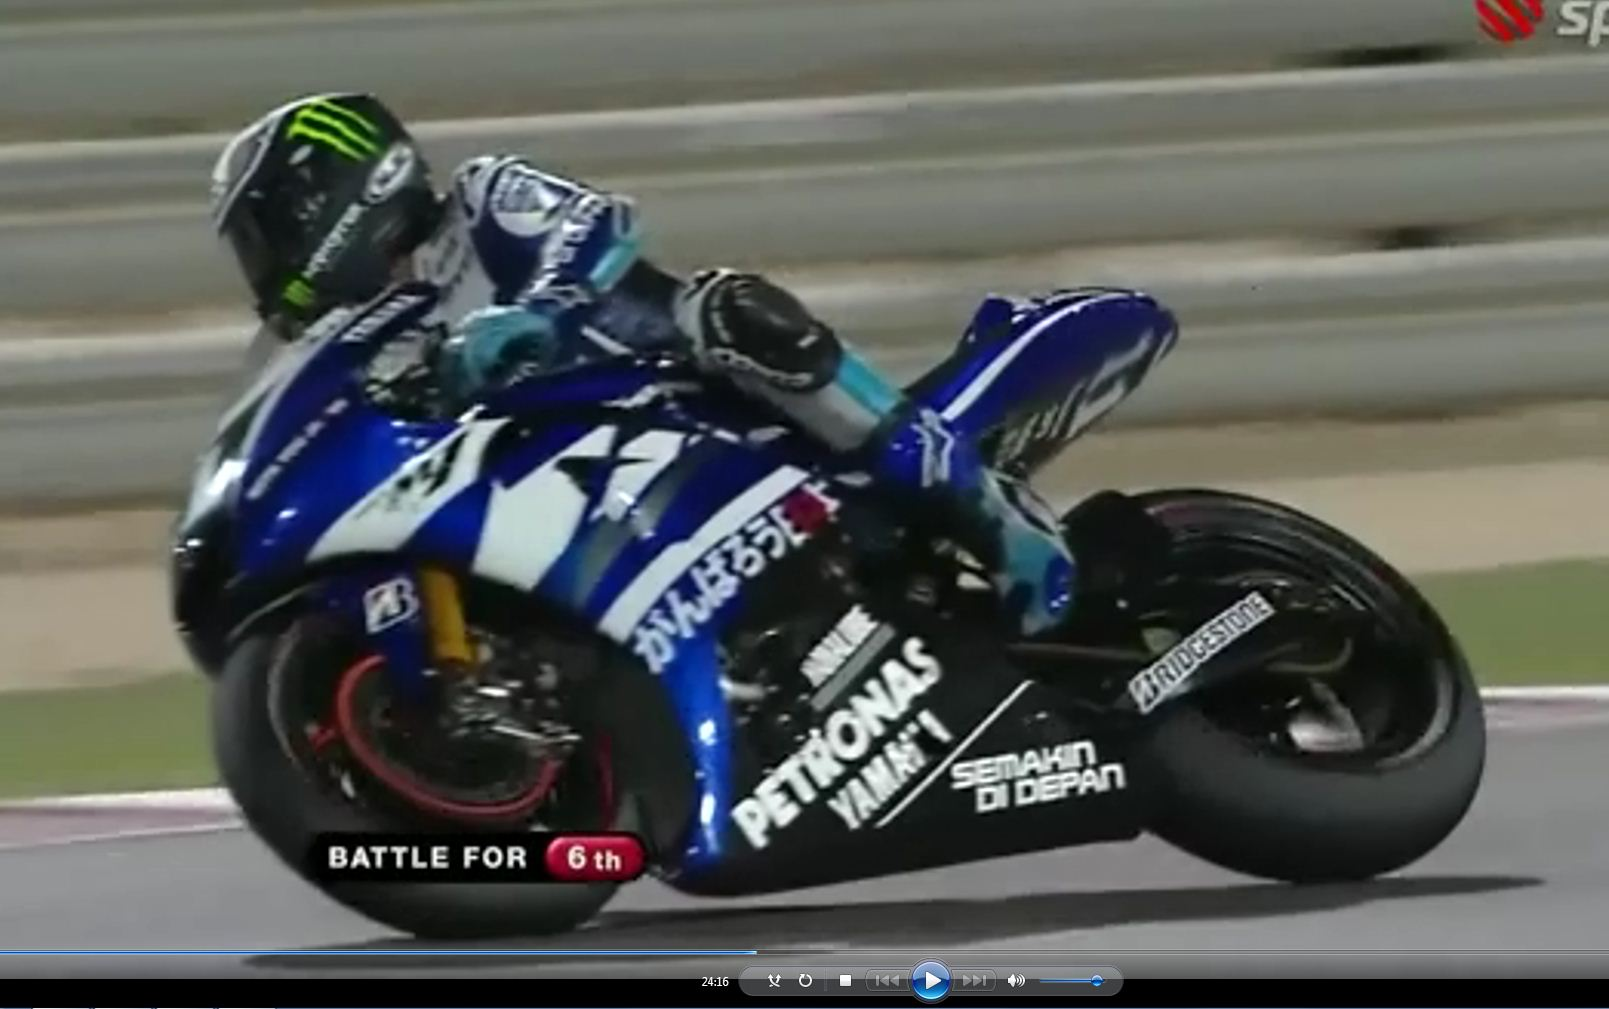 [MotoGP] GP Qatar - Page 6 Spies10